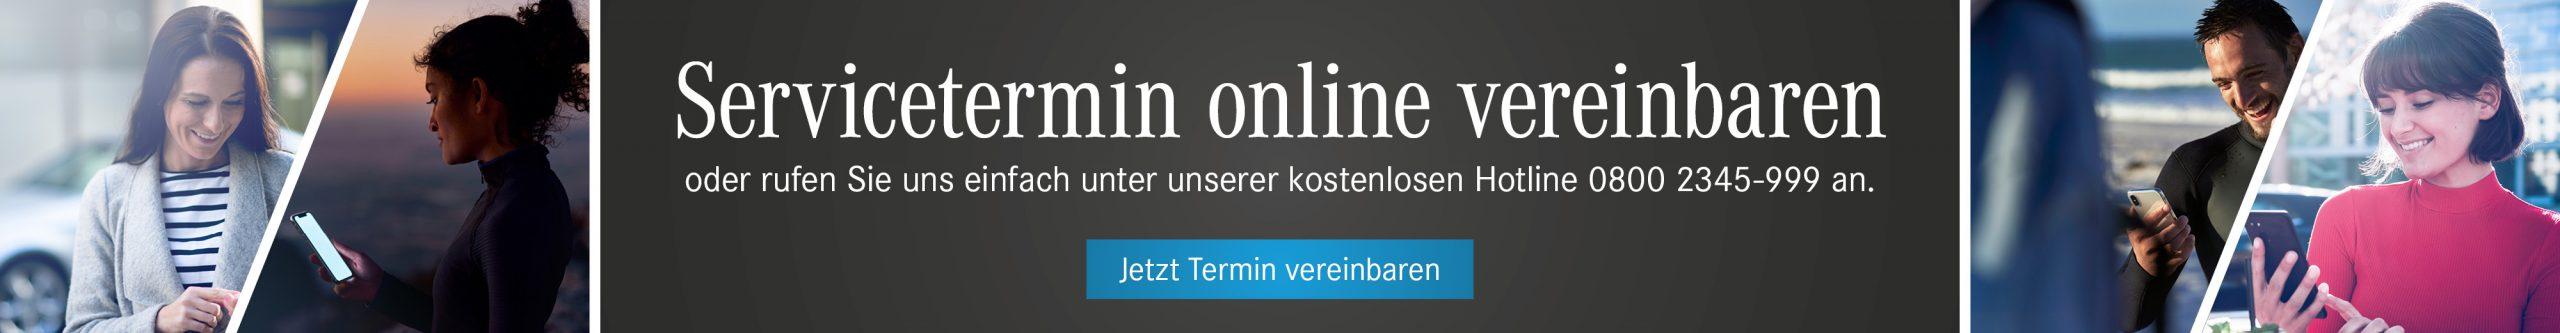 Servicetermin-mercedes benz brinkmann das autohaus